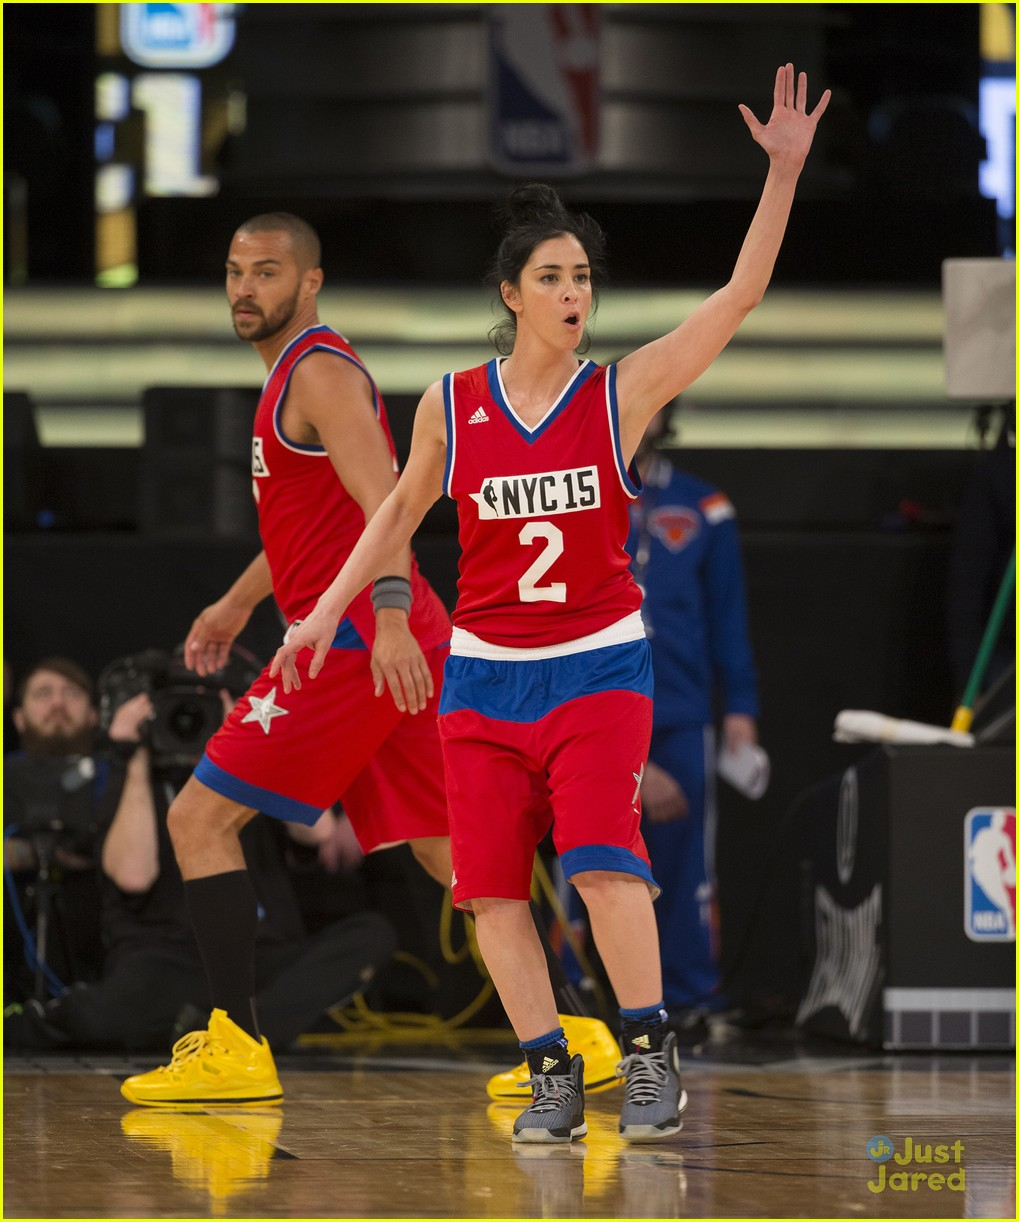 Sarah singley basketball